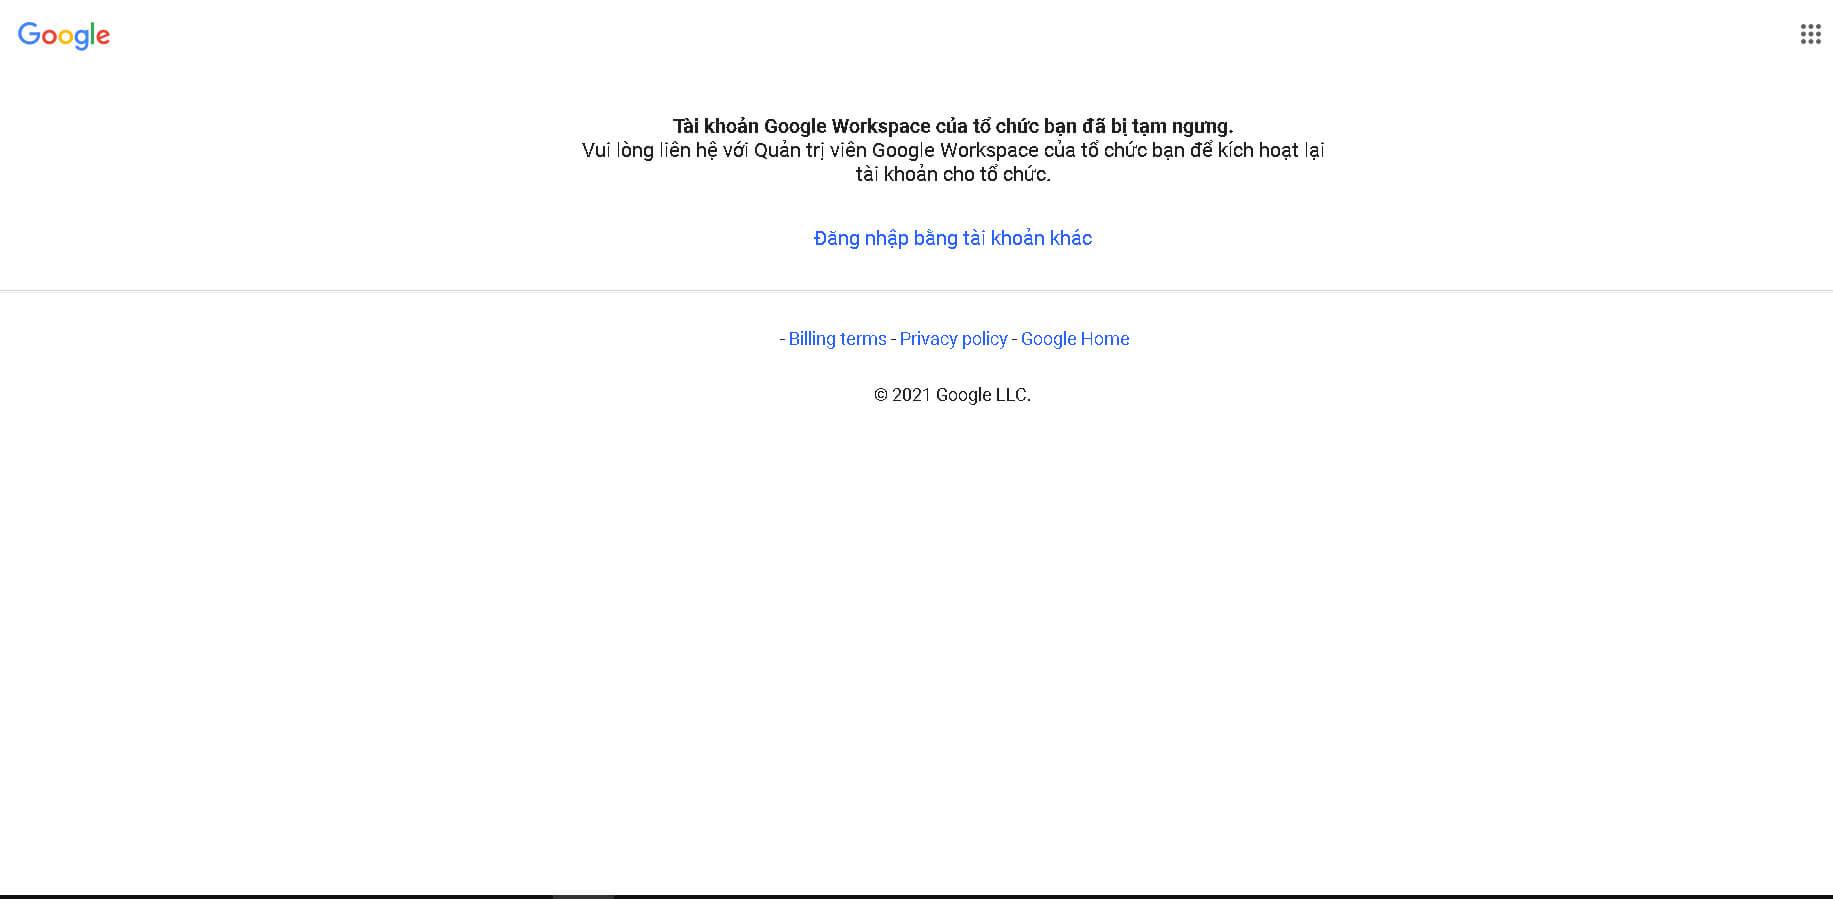 Tài khoản Google Workspace bị khoá